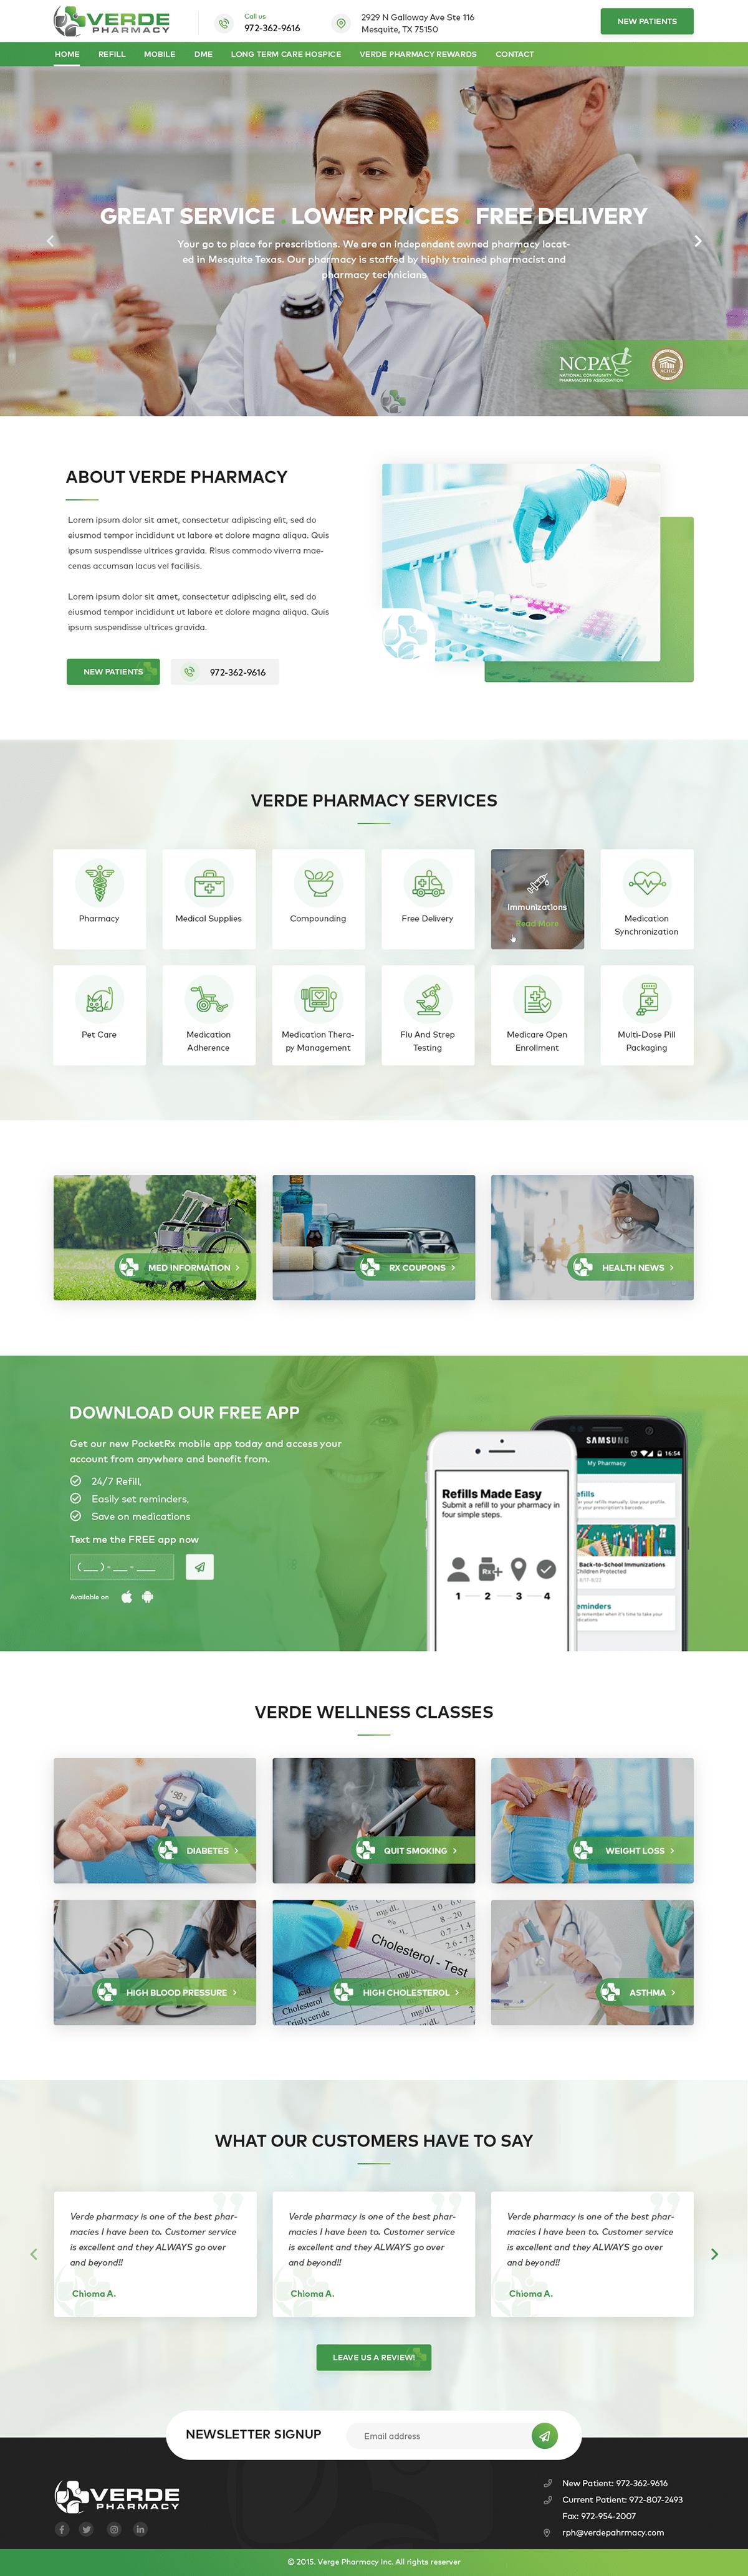 clean website corporate website Medical Website minimalist minimalist design modern website pharmaceutical website pharmacy simple website ui design